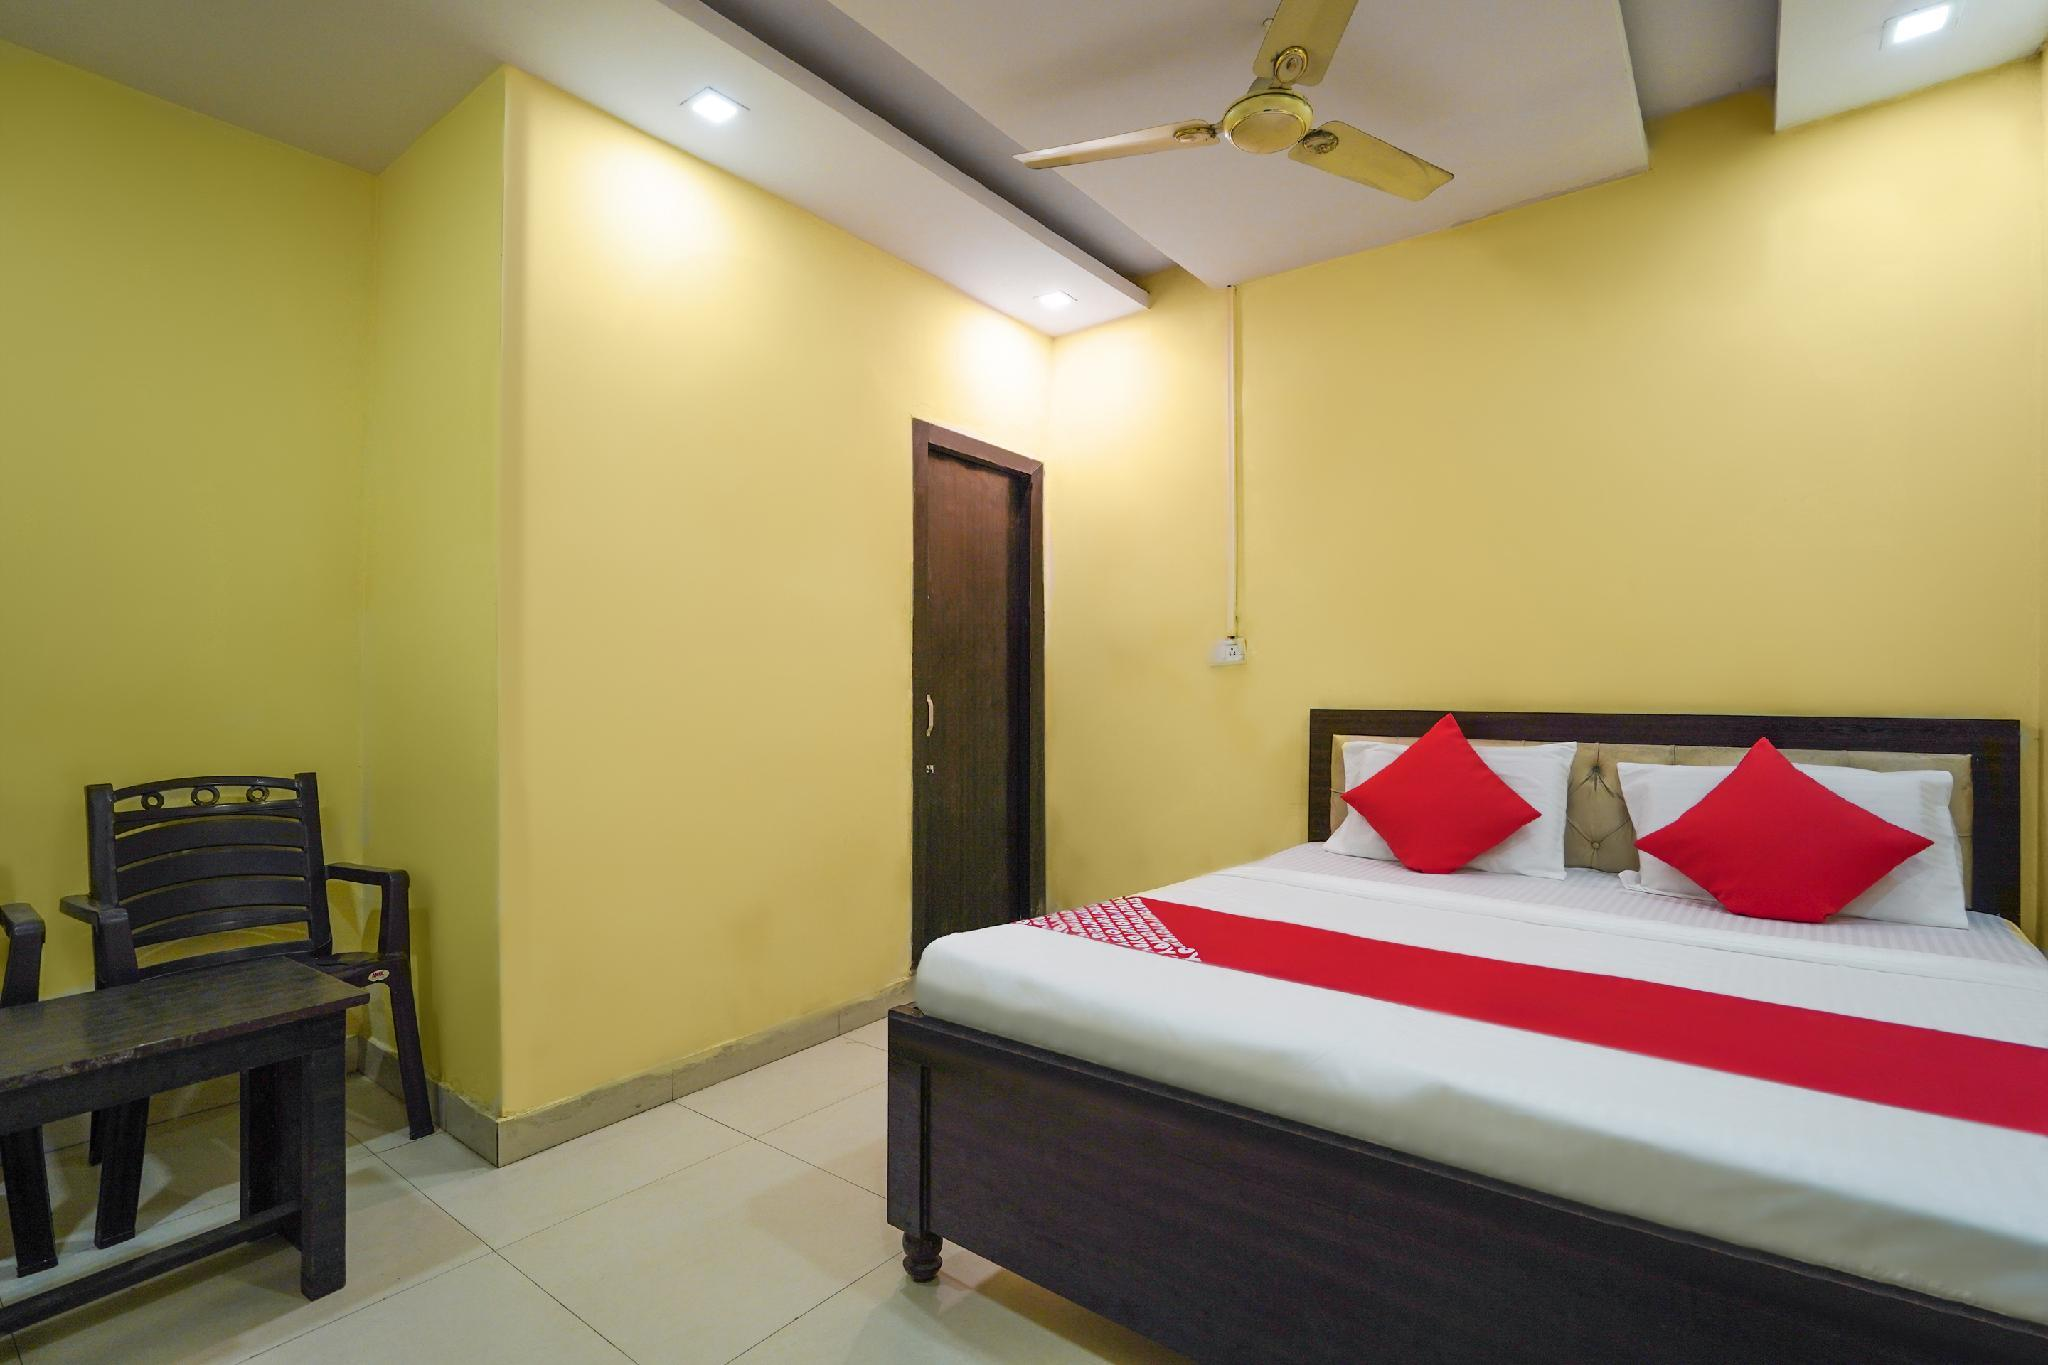 OYO 49342 Hotel Narula's